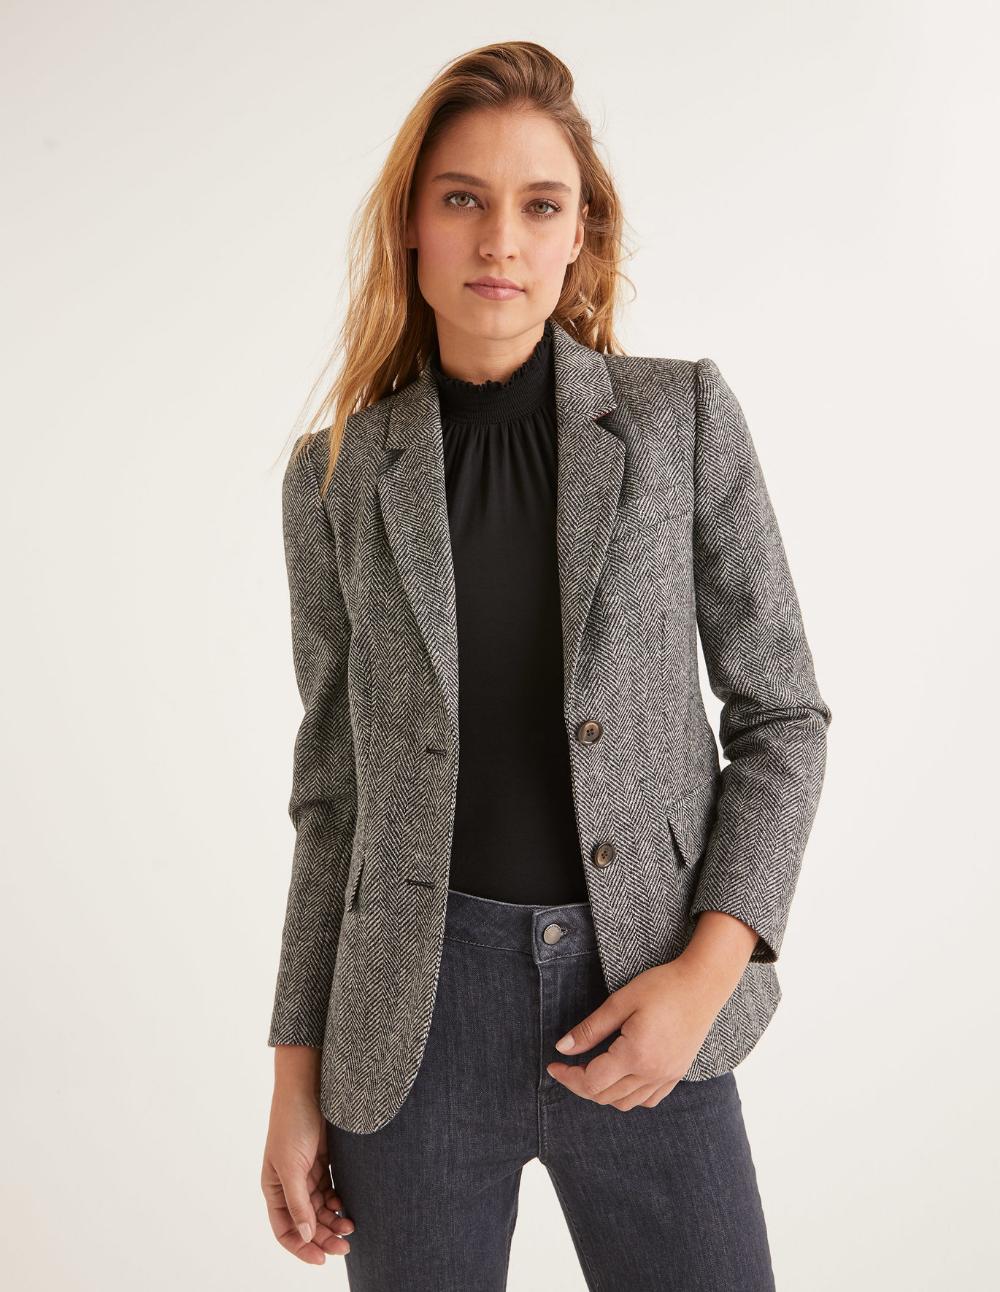 Smyth Tweed Blazer Charcoal Herringbone Blazer Tweed Blazer Tweed